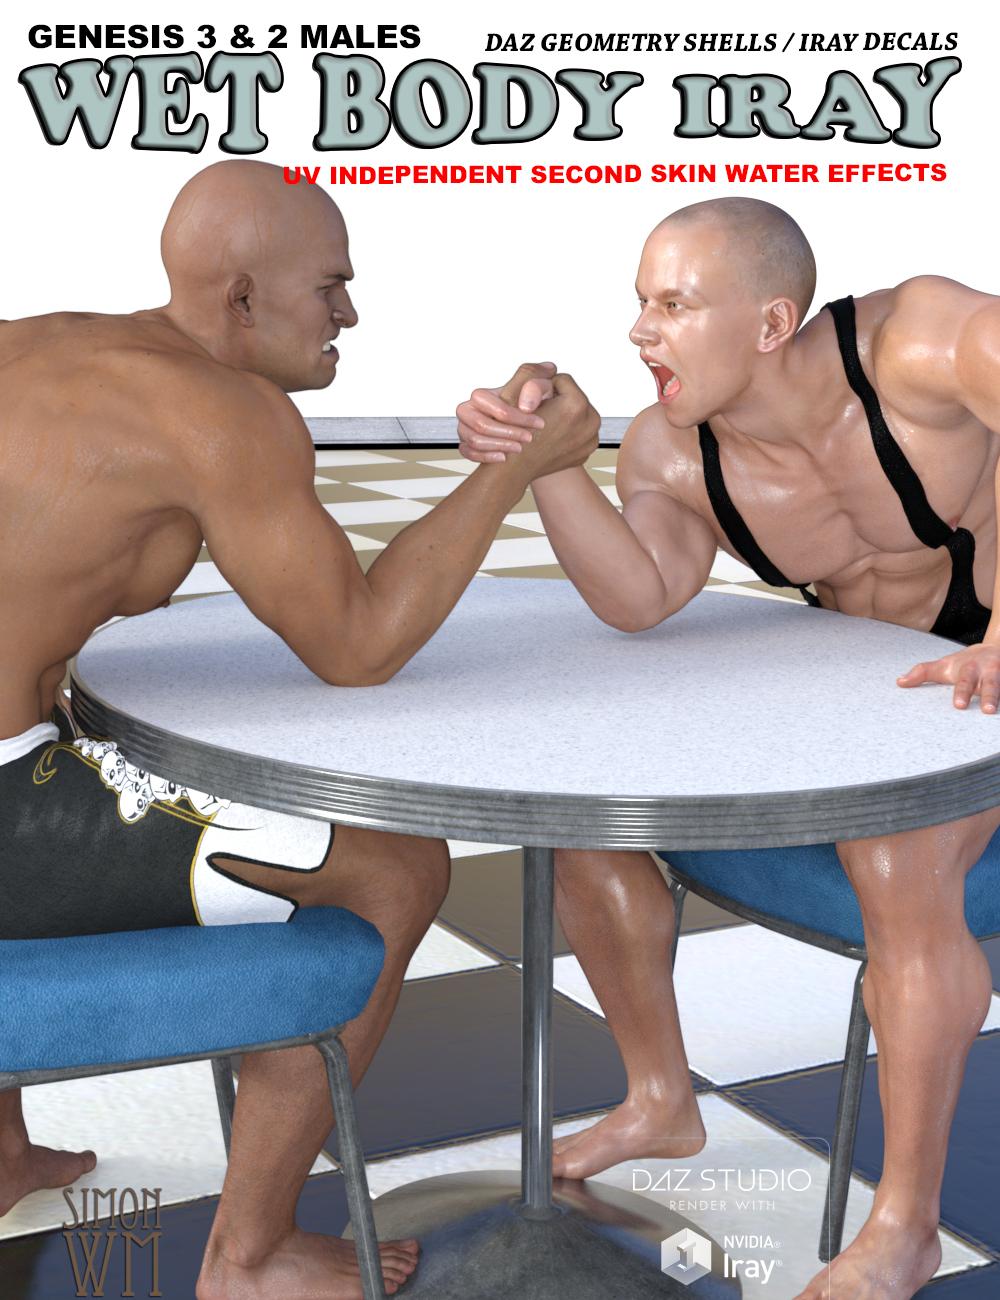 Wet Body Iray Bundle for Genesis 3 & 2 Male(s) by: SimonWM, 3D Models by Daz 3D